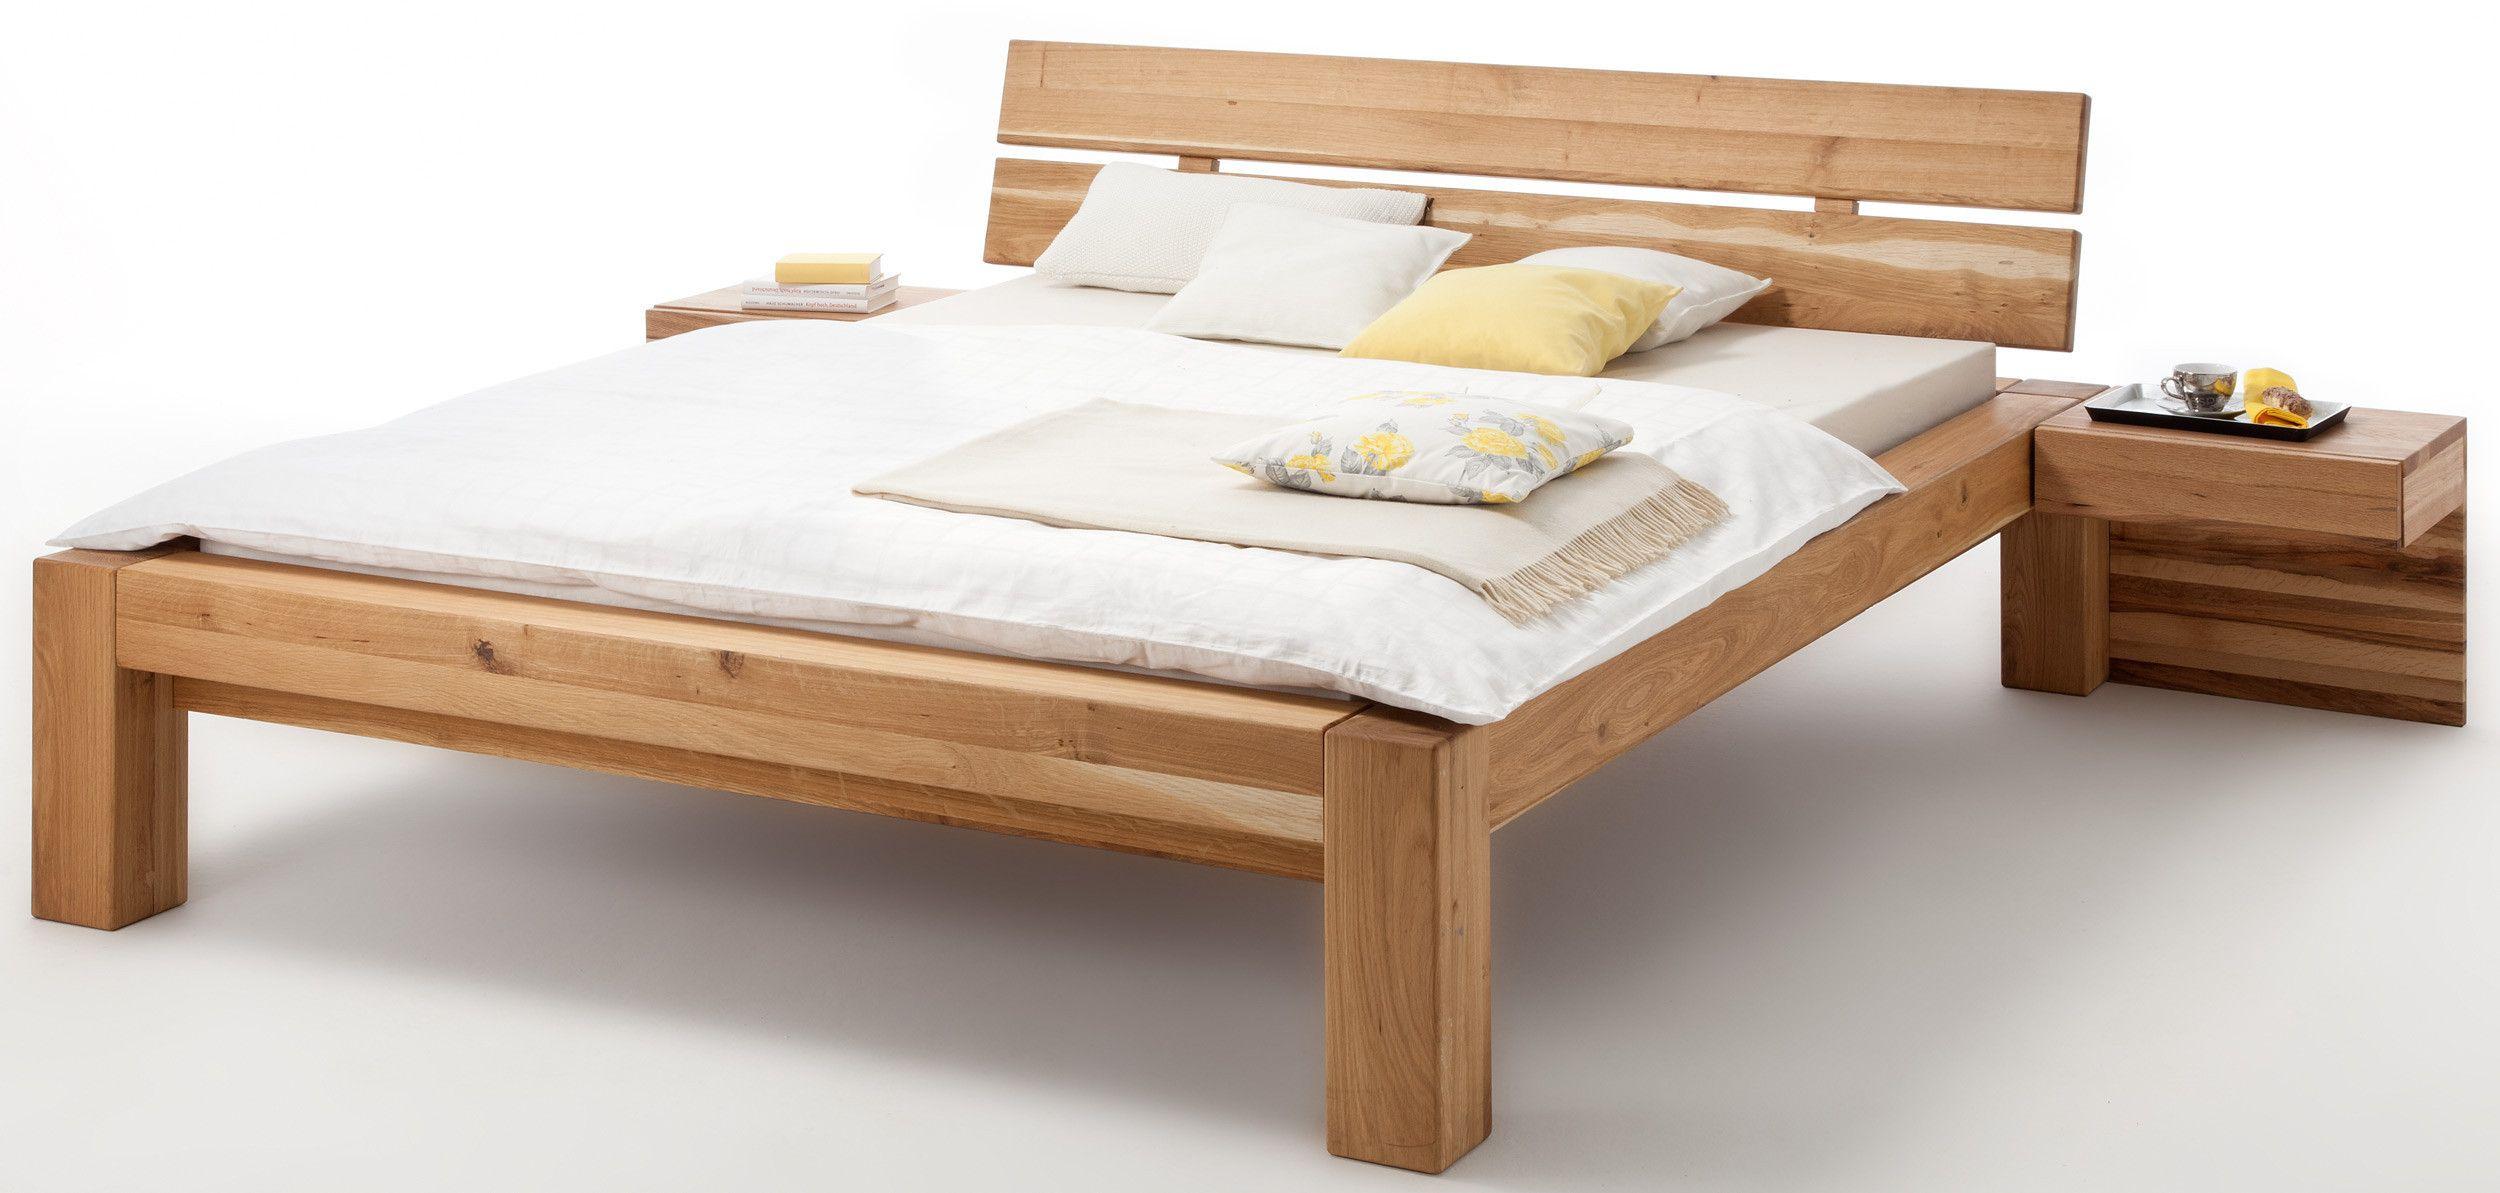 Holzbett 1 40 2 00 Luxury Die 20 Besten Ideen Fur Holzbett 1 40 2 00 Beste Bett Massivholz Bett 160x200 Big Sofa Mit Schlaffunktion